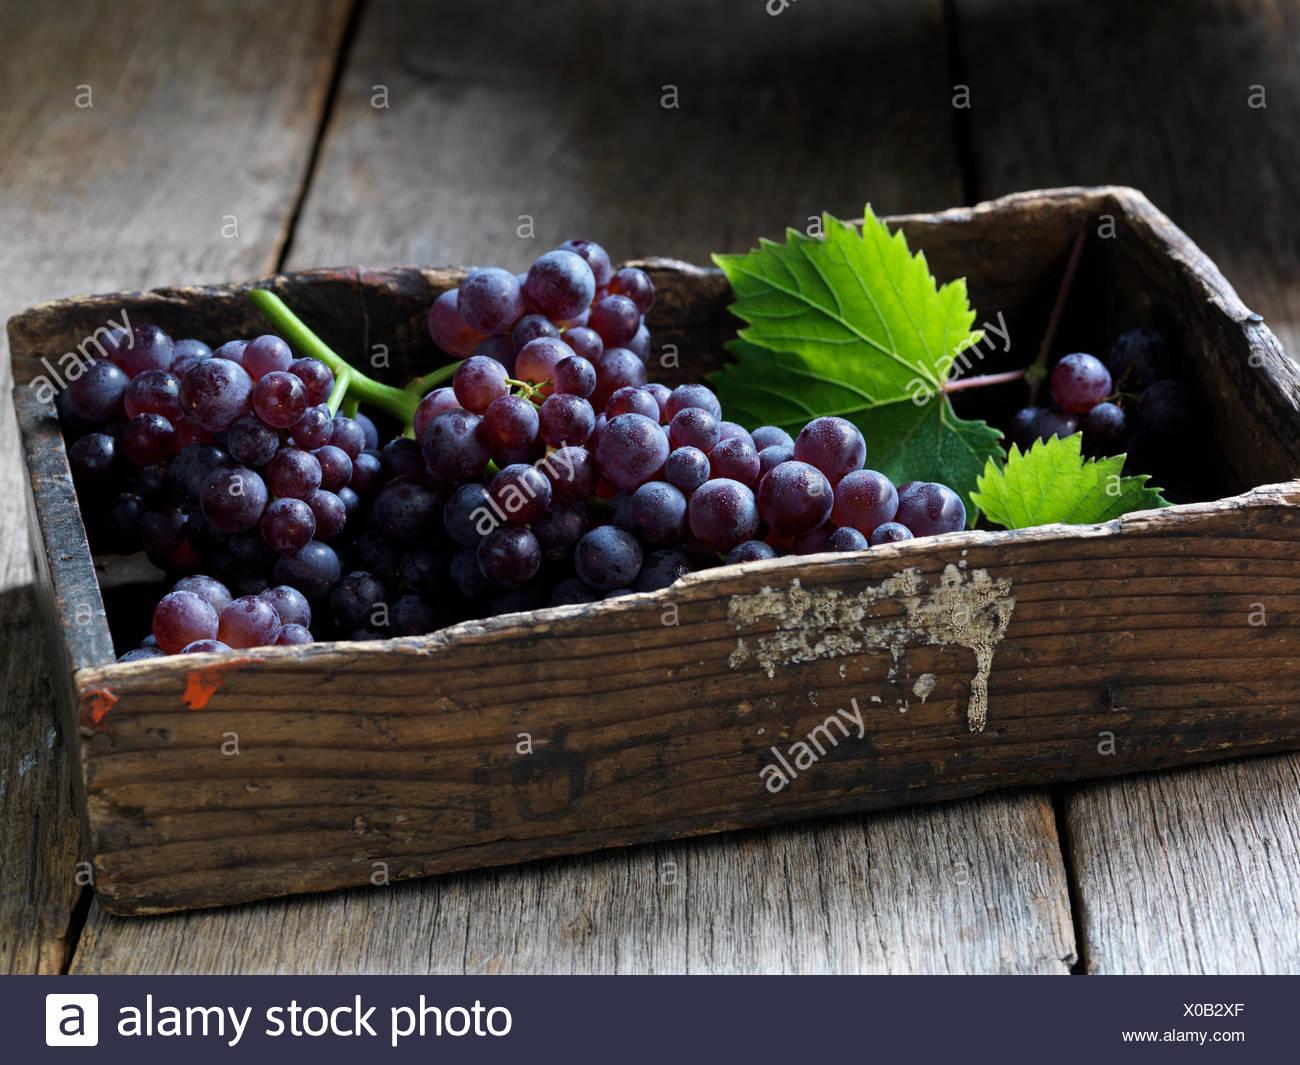 Frutas frescas orgánicas, uvas de fresa Imagen De Stock